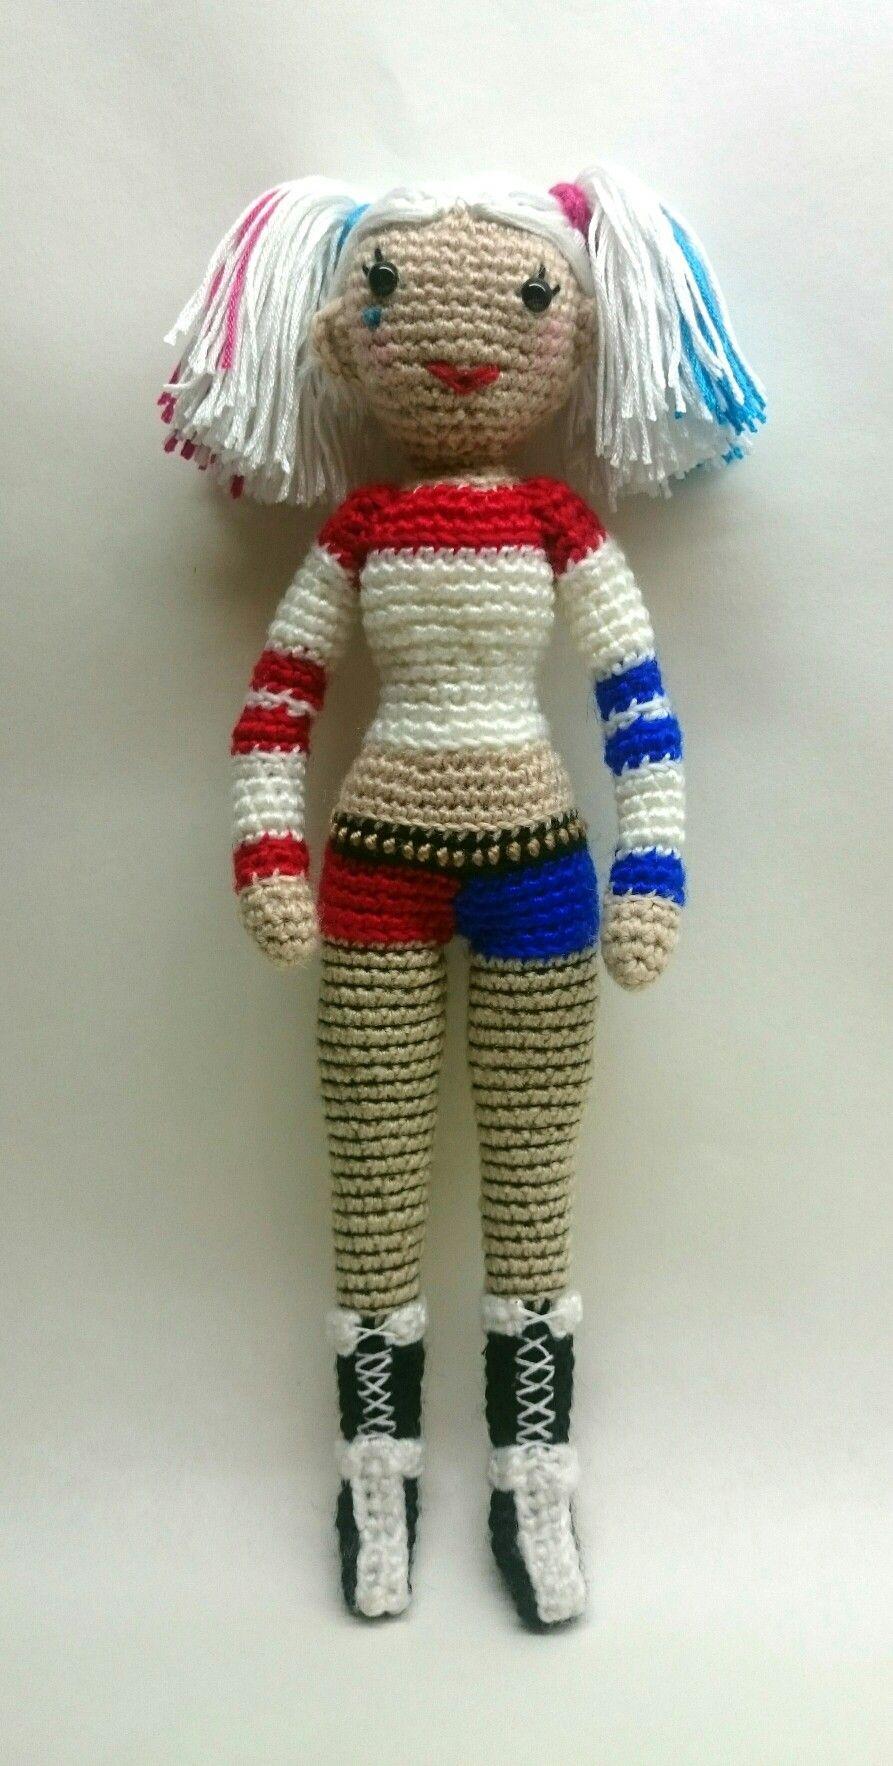 Veros Superheros & Villains Crochet Dolls - Happy Crocheting | 1766x893